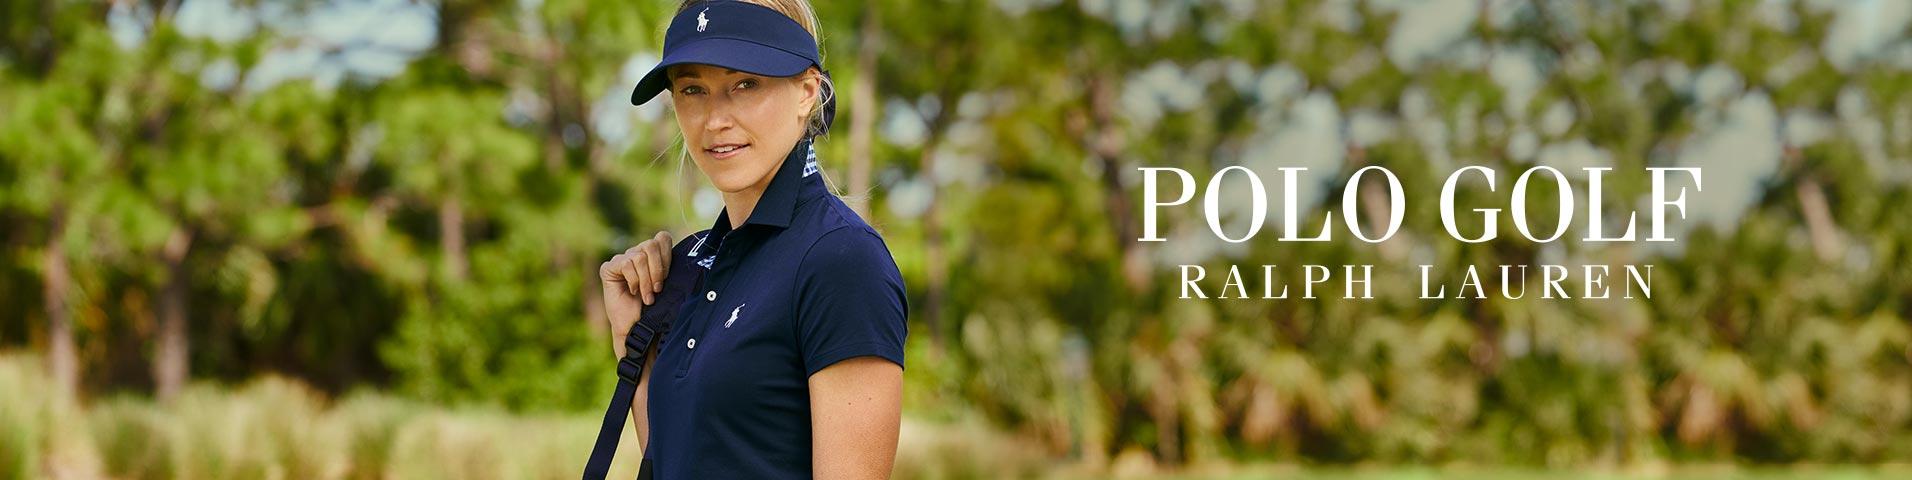 c550752a0 Polo Ralph Lauren Golf Women's Clothing | Clothes for Women | ZALANDO UK